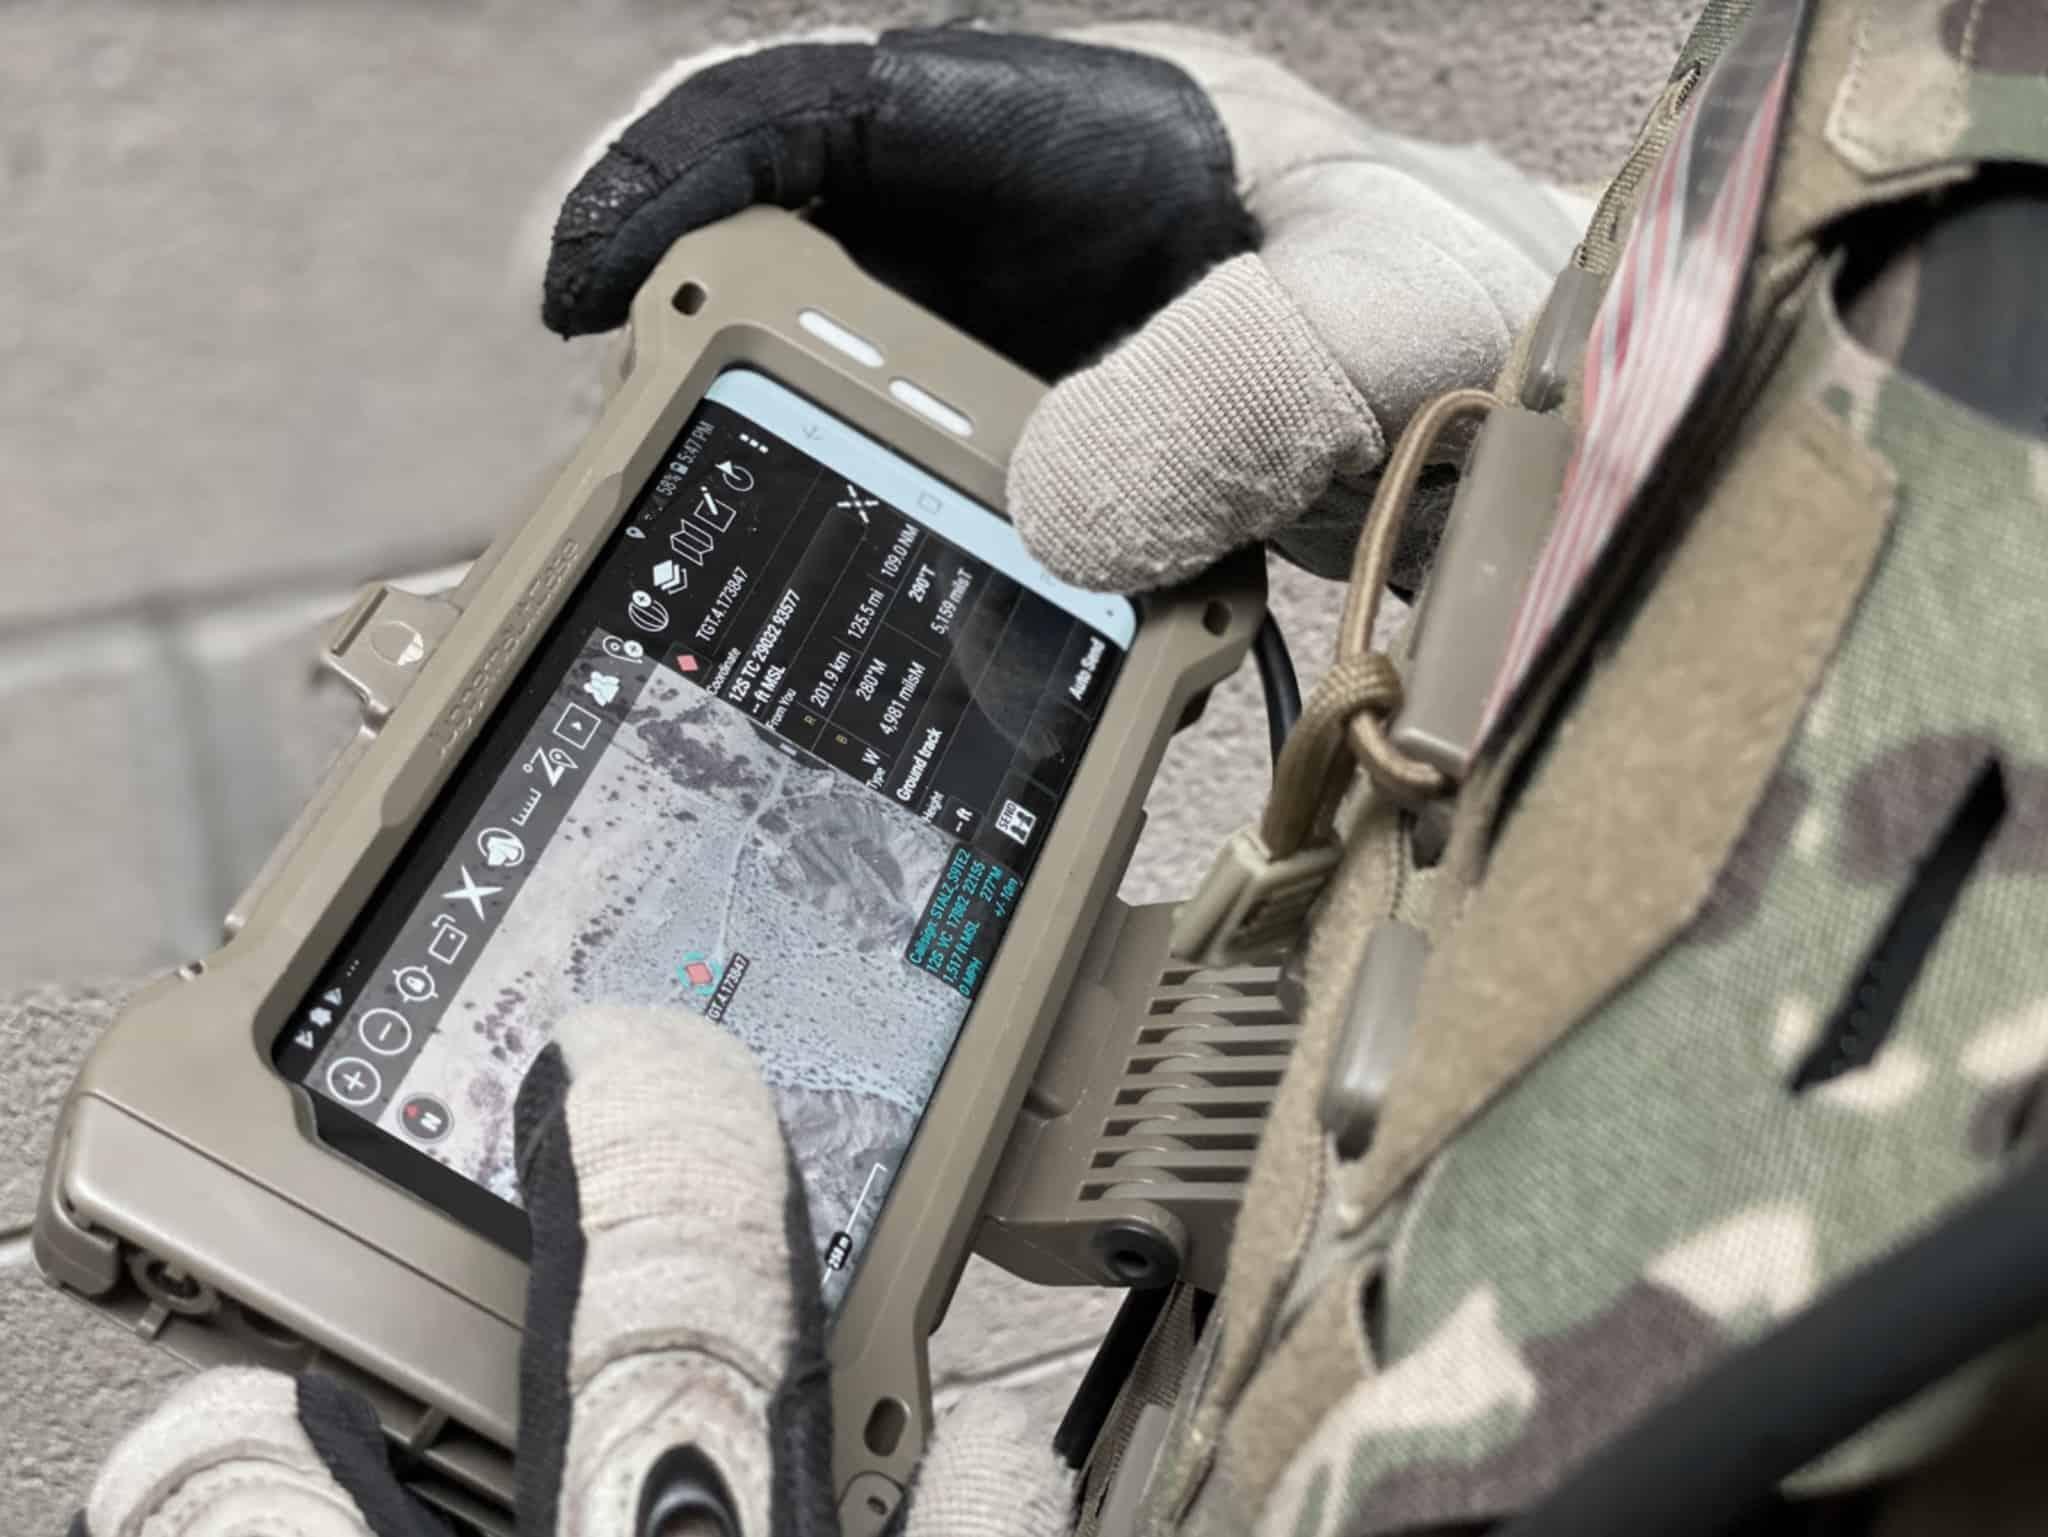 Samsung Galaxy S20 Tactical Edition image 1